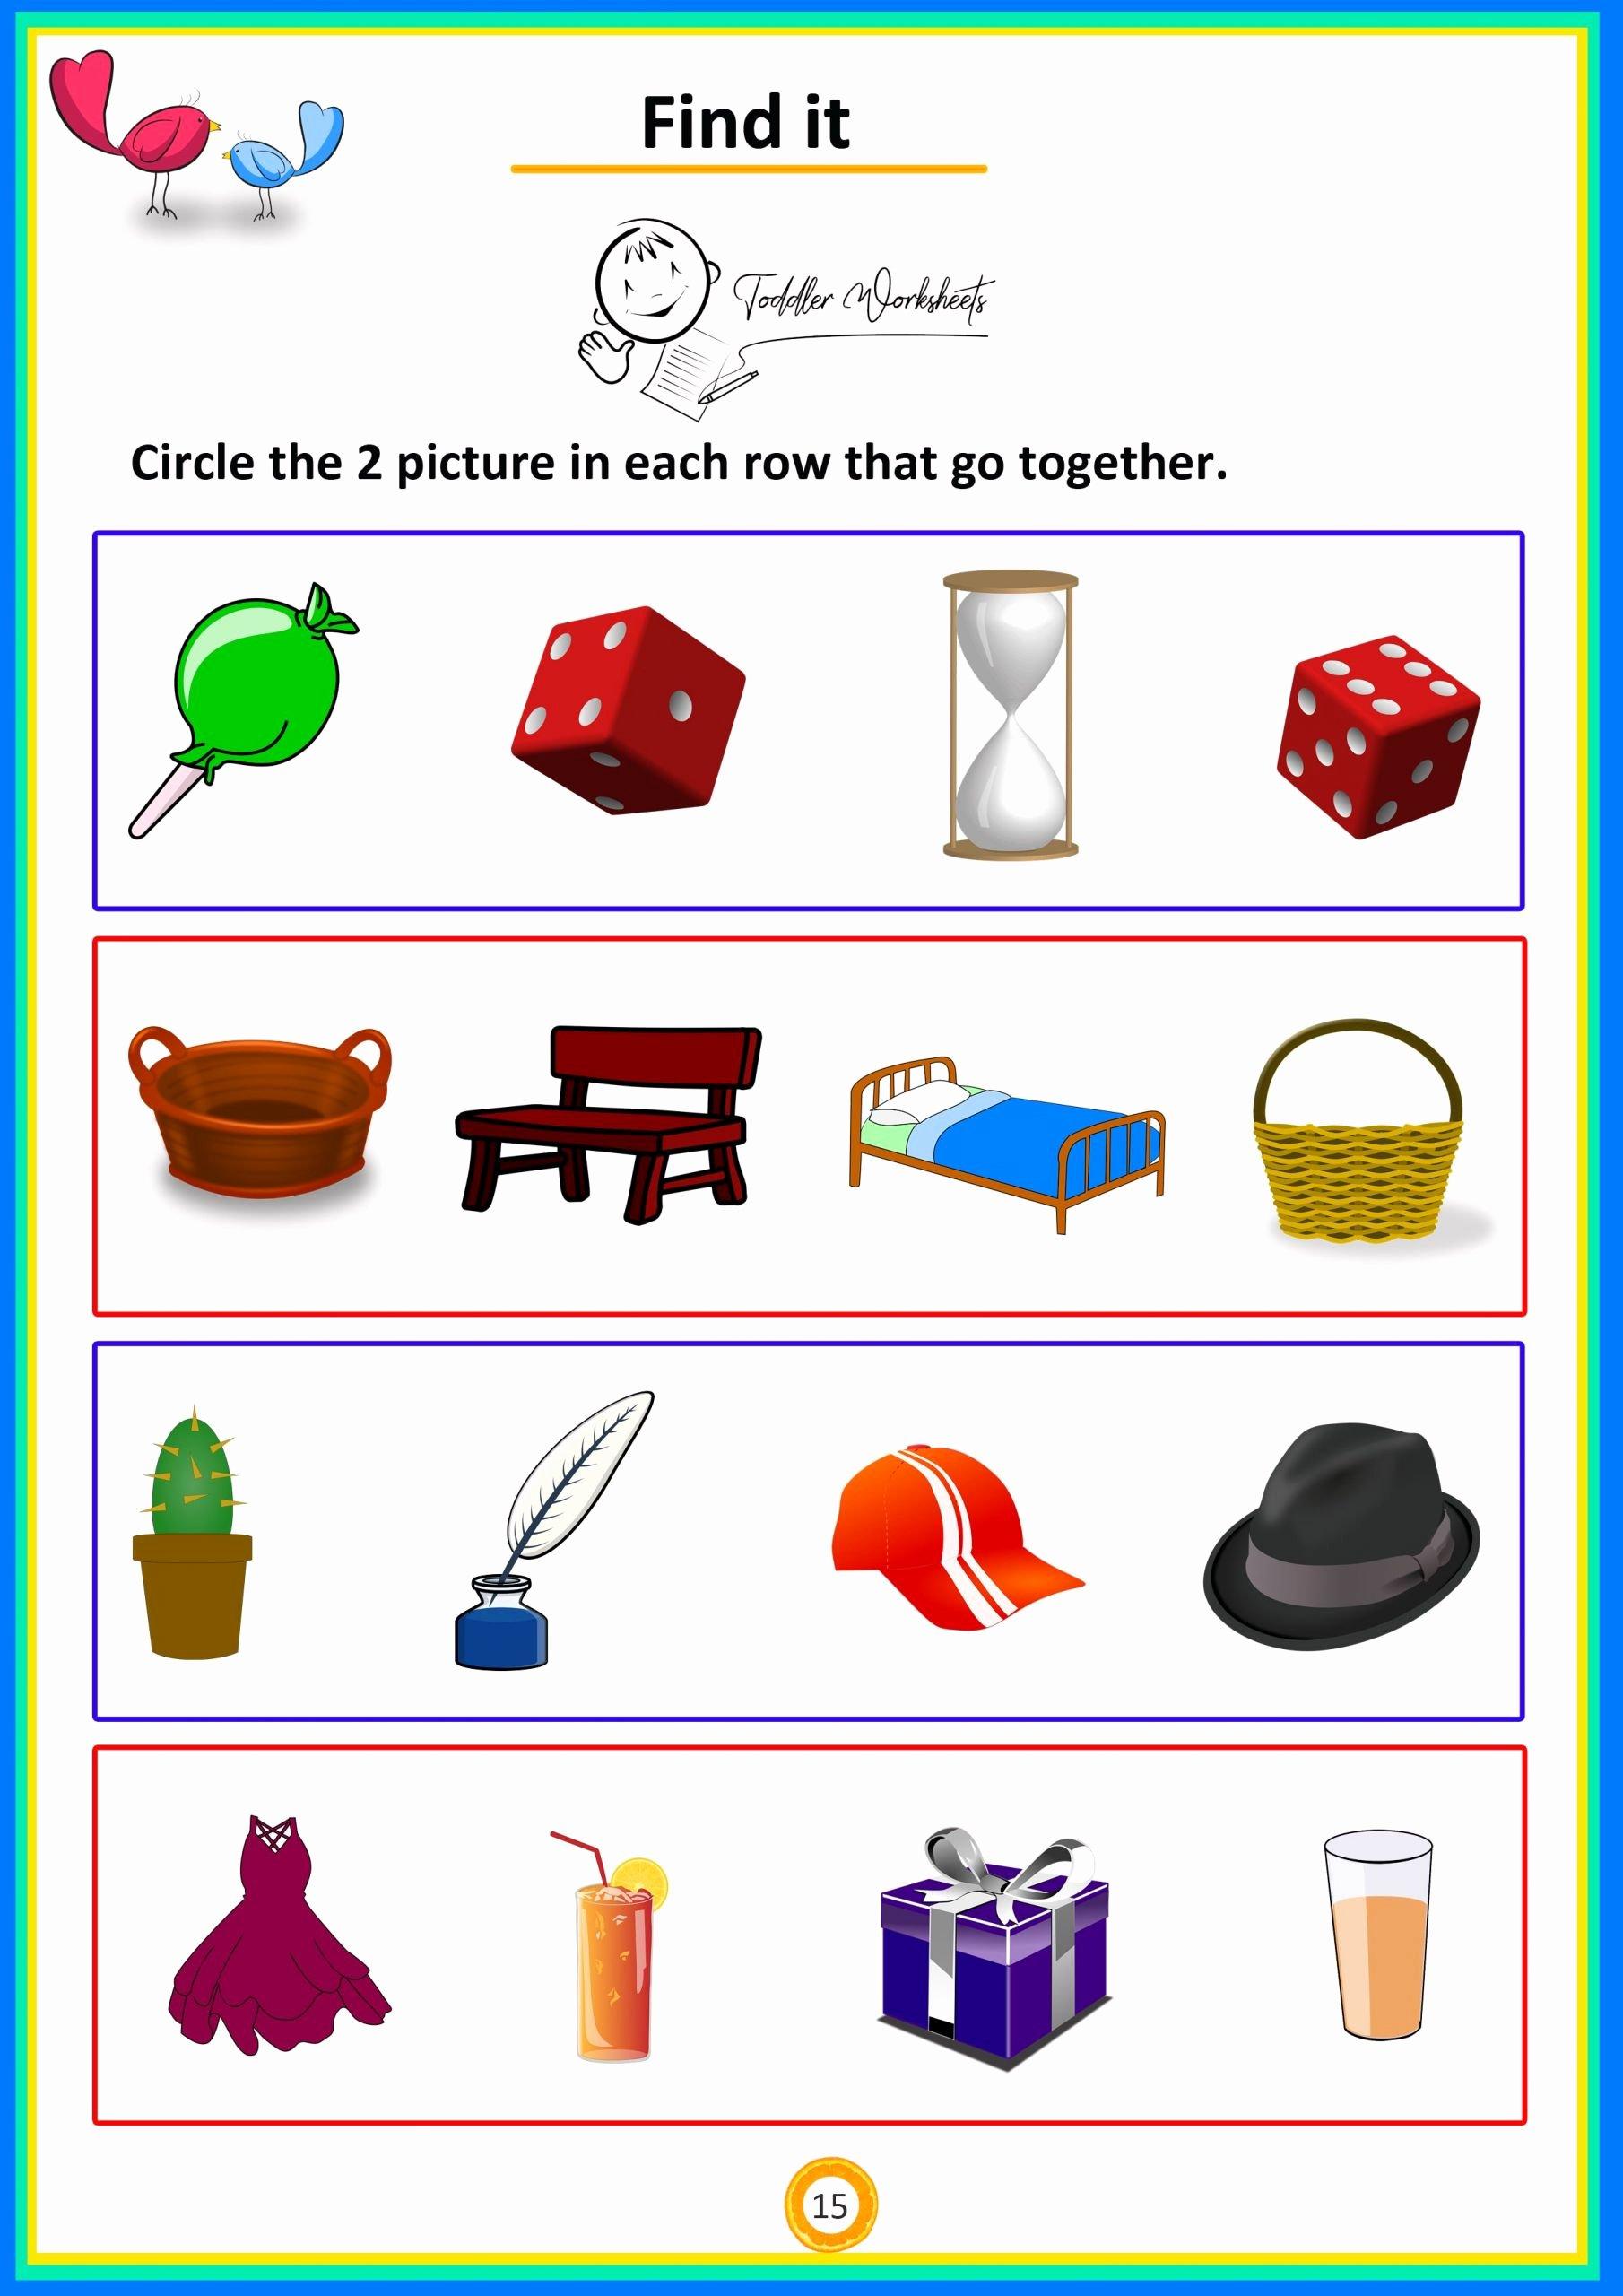 Math Worksheets for Preschoolers Printables Best Of Math Worksheet Matheeteets Preschool Free Printable